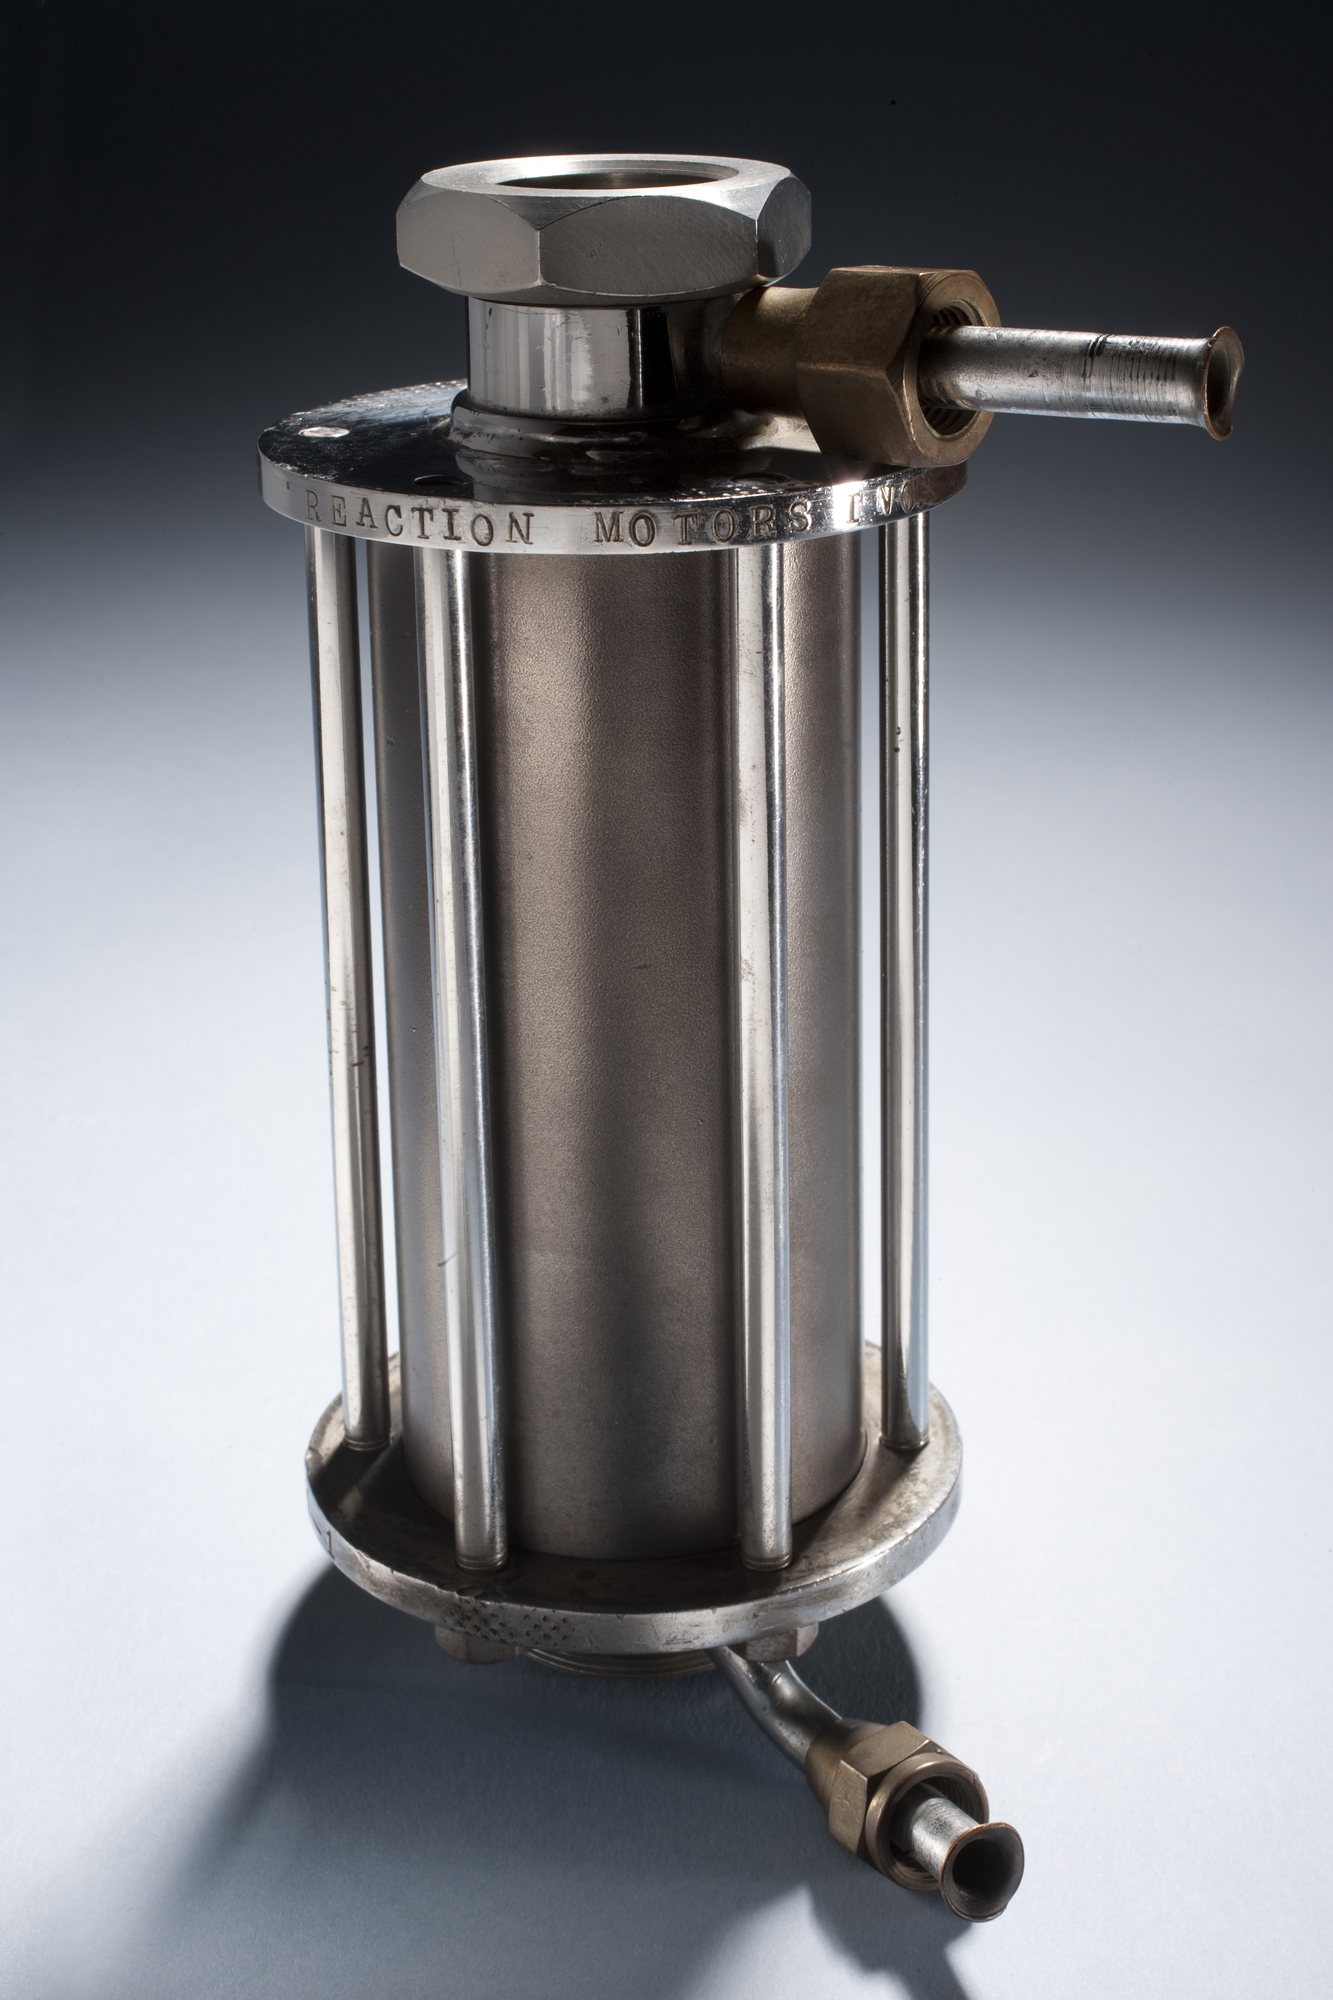 Wyld Regeneratively Cooled Rocket Motor No. 1